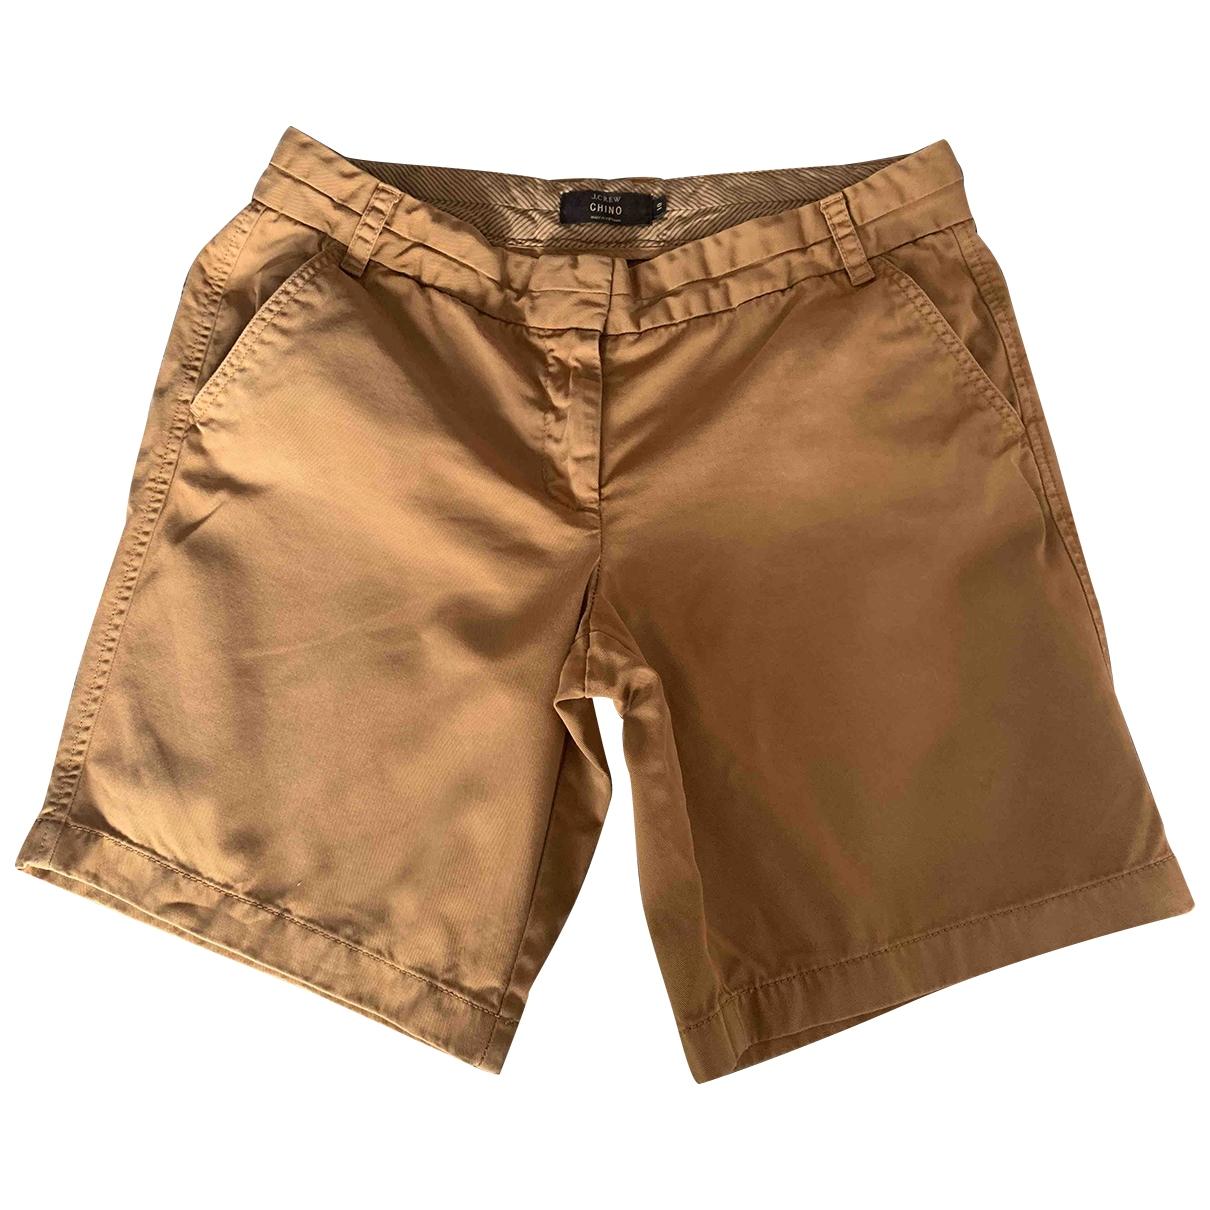 J.crew \N Camel Cotton Shorts for Women 10 US